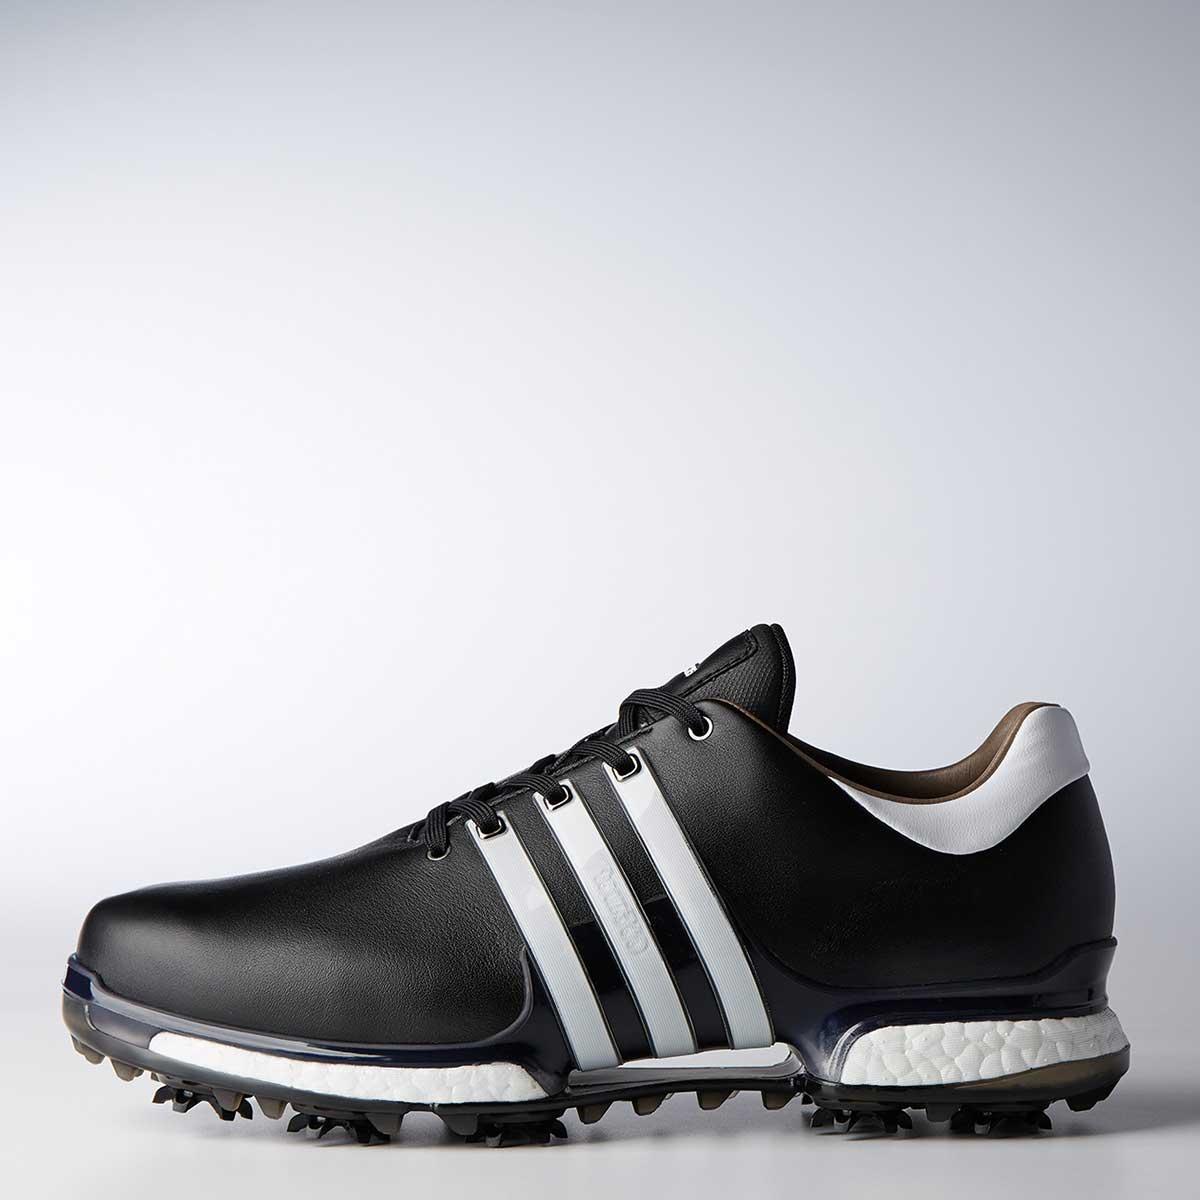 Adidas Tour360 Boost 2 Golf Shoe - Black/White